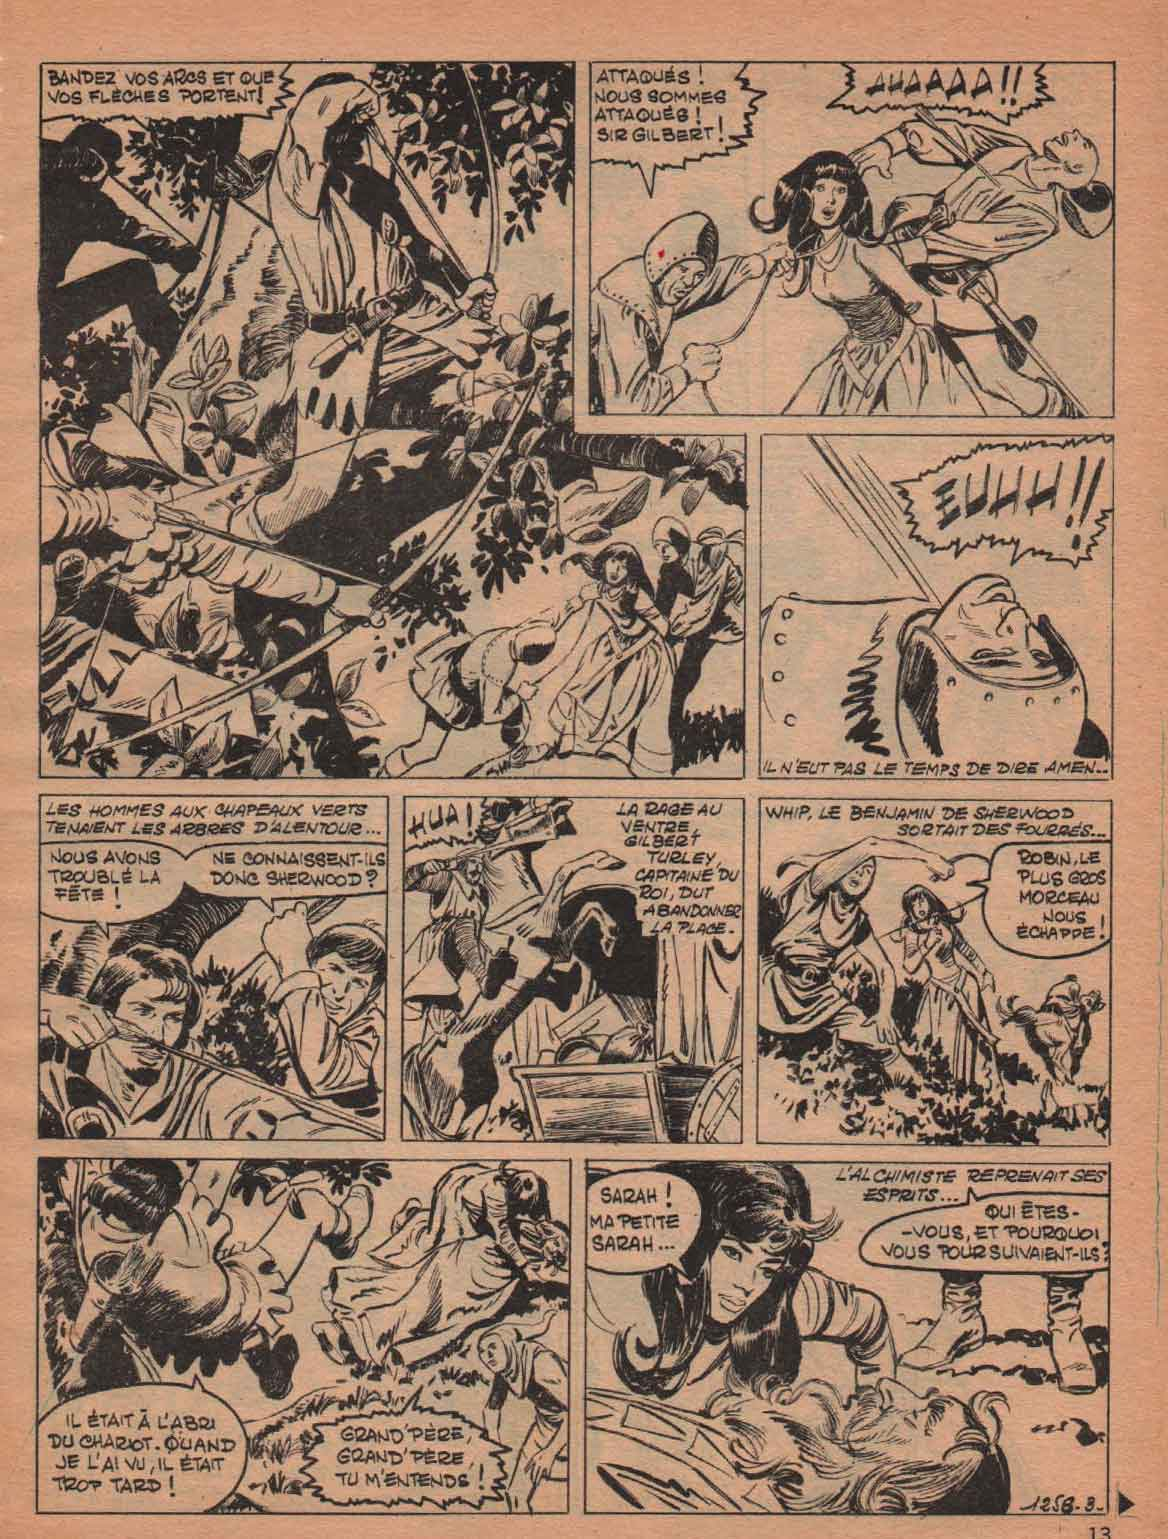 « Robin des bois » Pif gadget n° 1258/20 (07/1969).